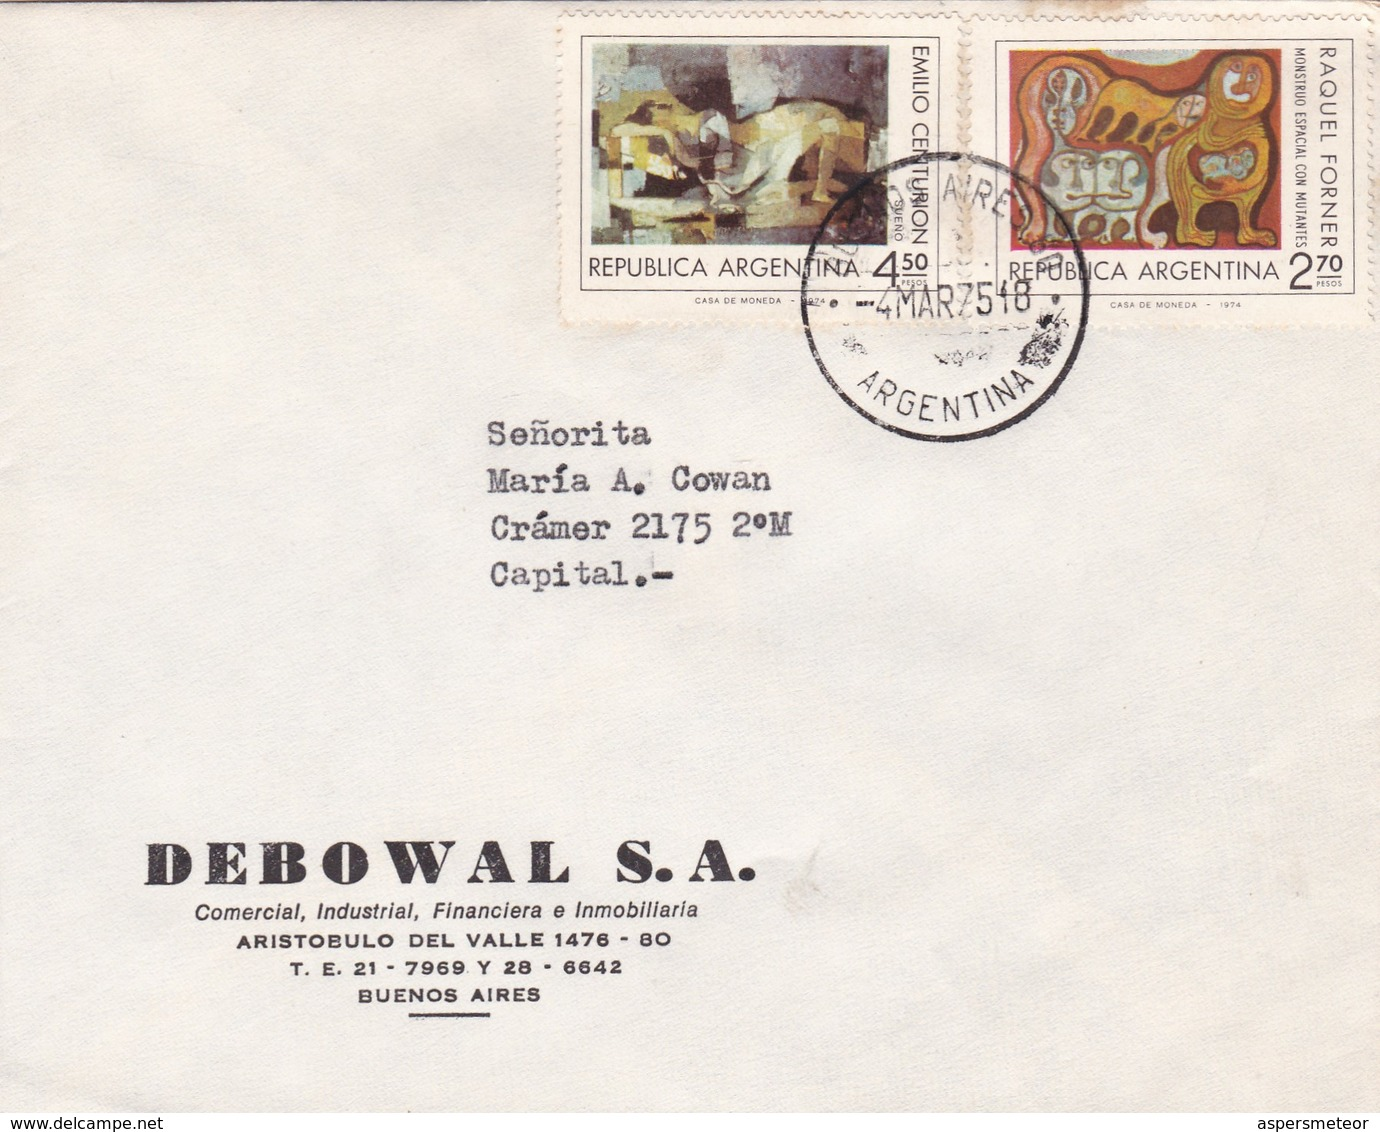 DEBOWAL SA. ENVELOPPE CIRCULEE BUENOS AIRES AN 1975 STAMPS THEMATIQUE D'ARTS - BLEUP - Lettres & Documents